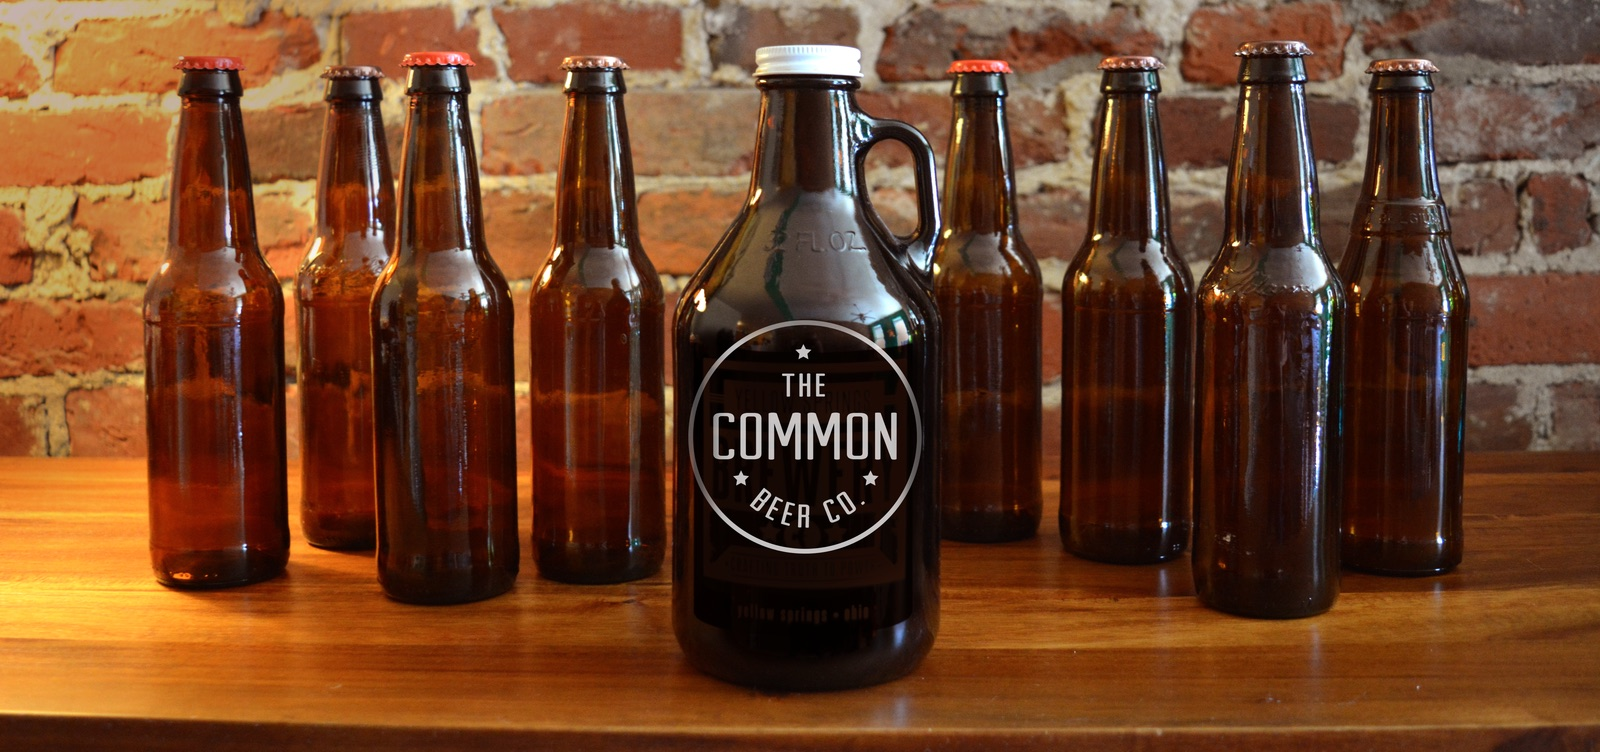 The Common Beer Company at Mason OH